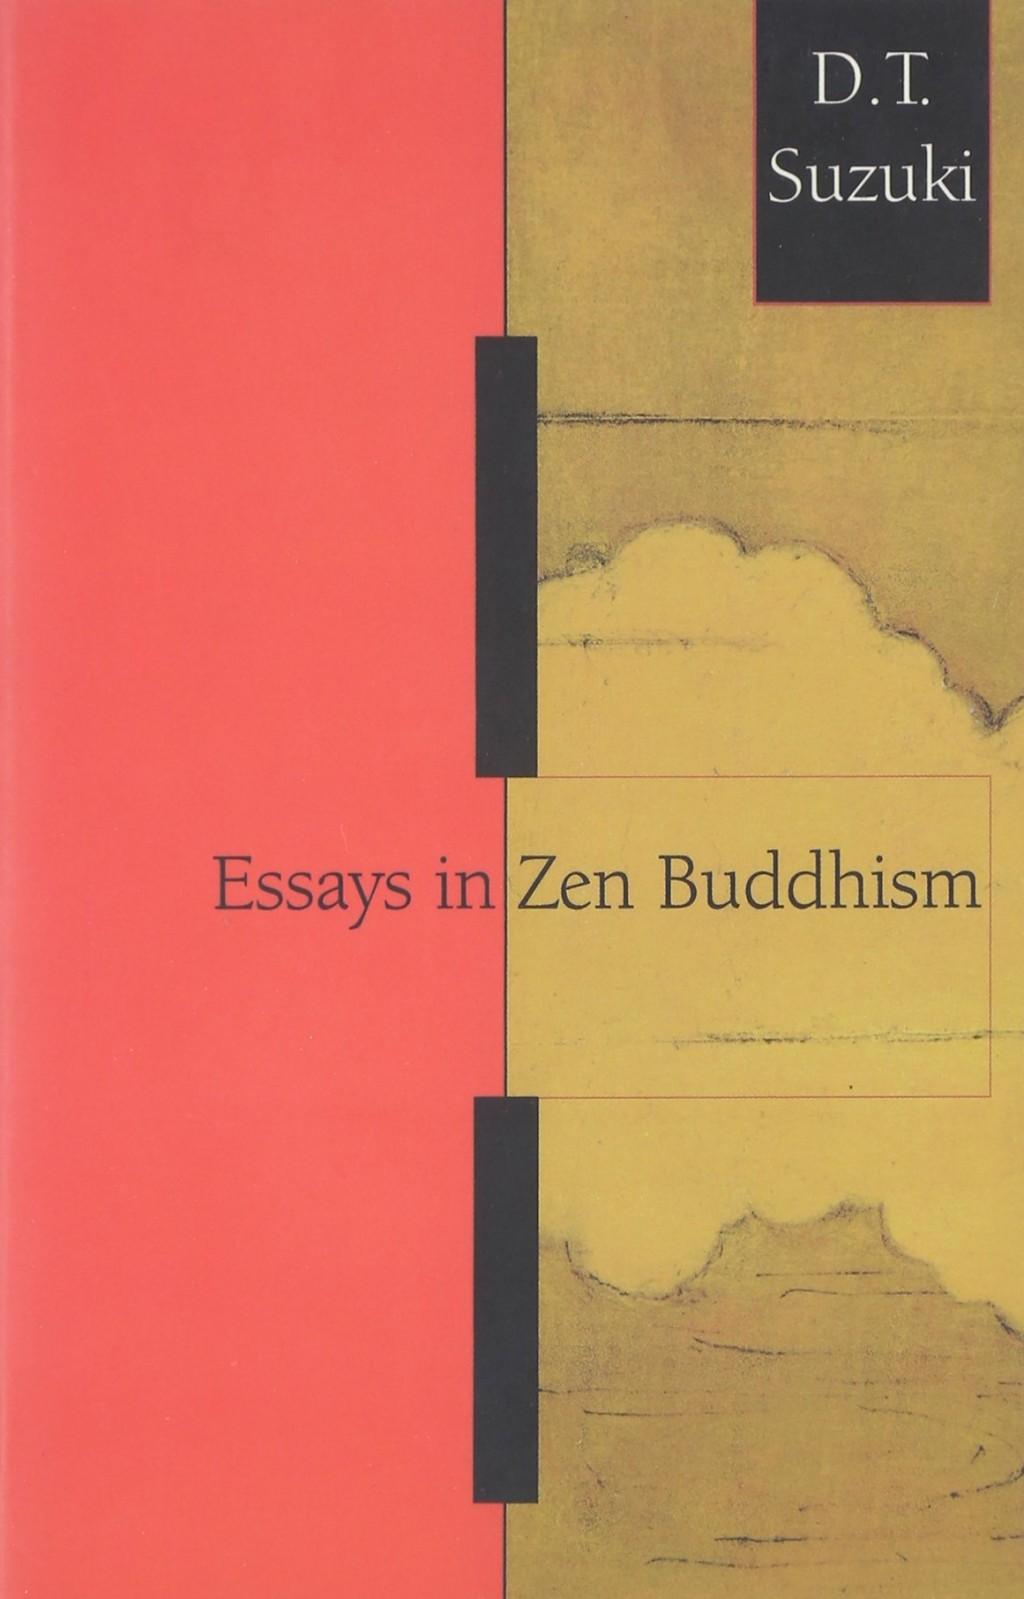 003 71cccelhvrl Essay Example Essays First Stunning Series Emerson Pdf Shelburne Publisher Large